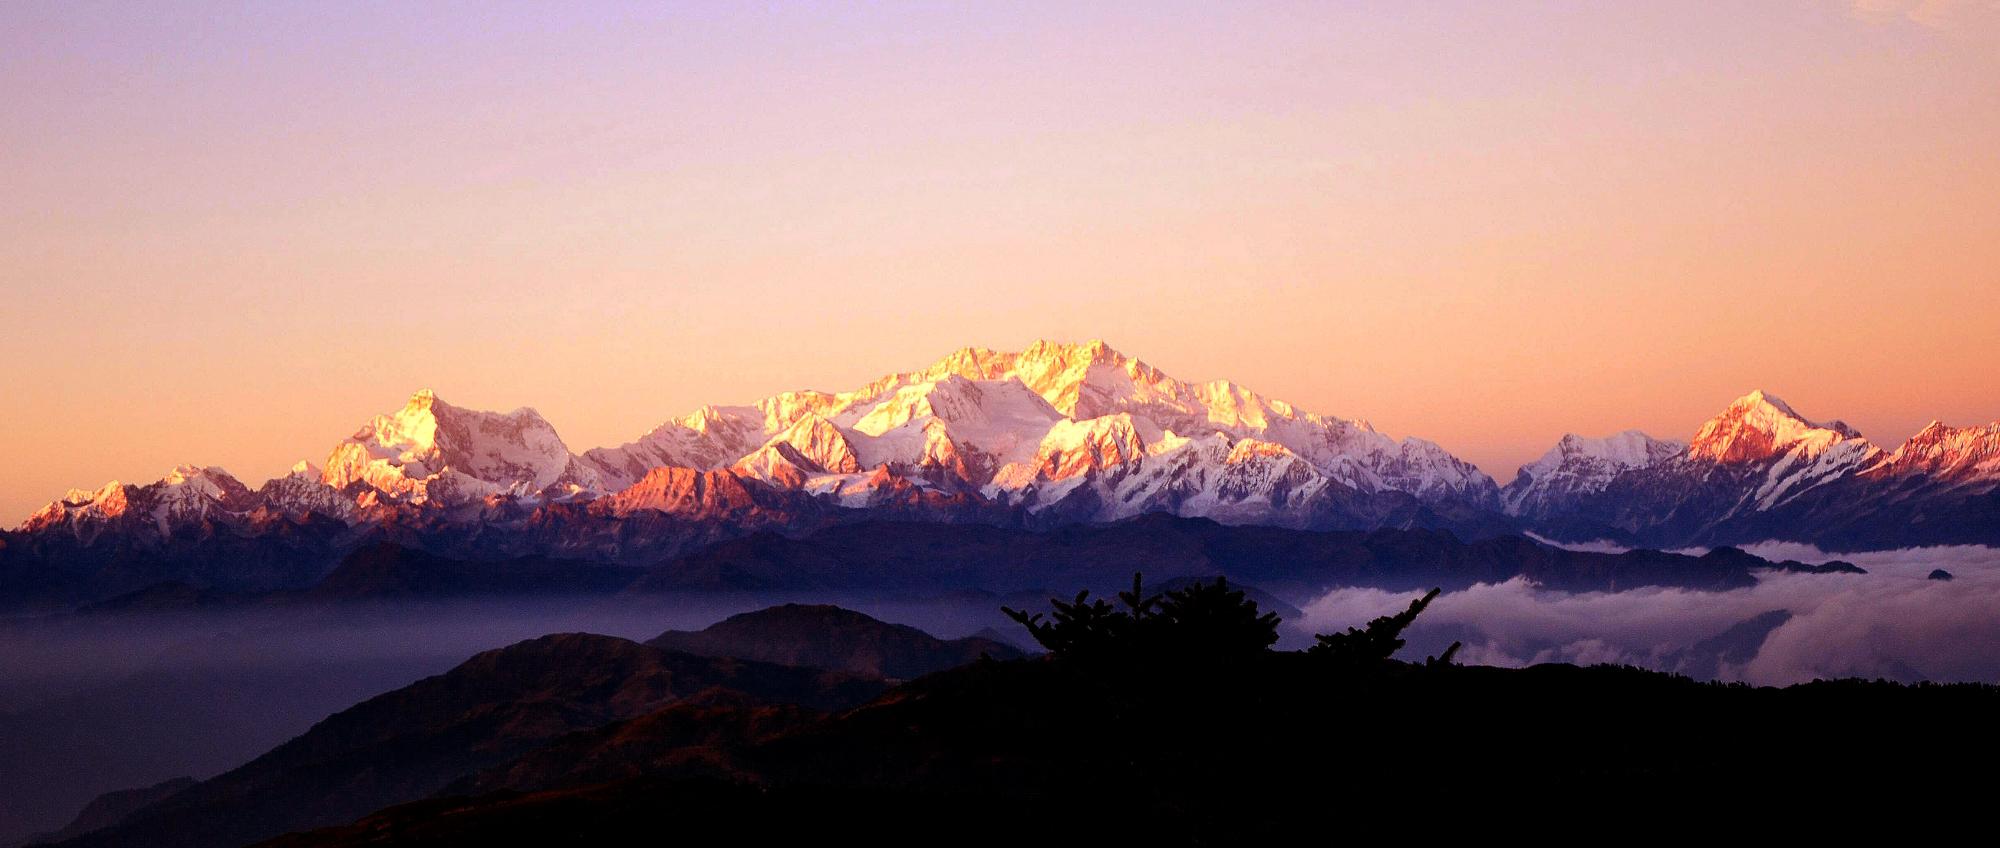 Himalaya Hd Wallpaper Kanchenjunga Base Camp Eco Trek Eco Holidays Asia